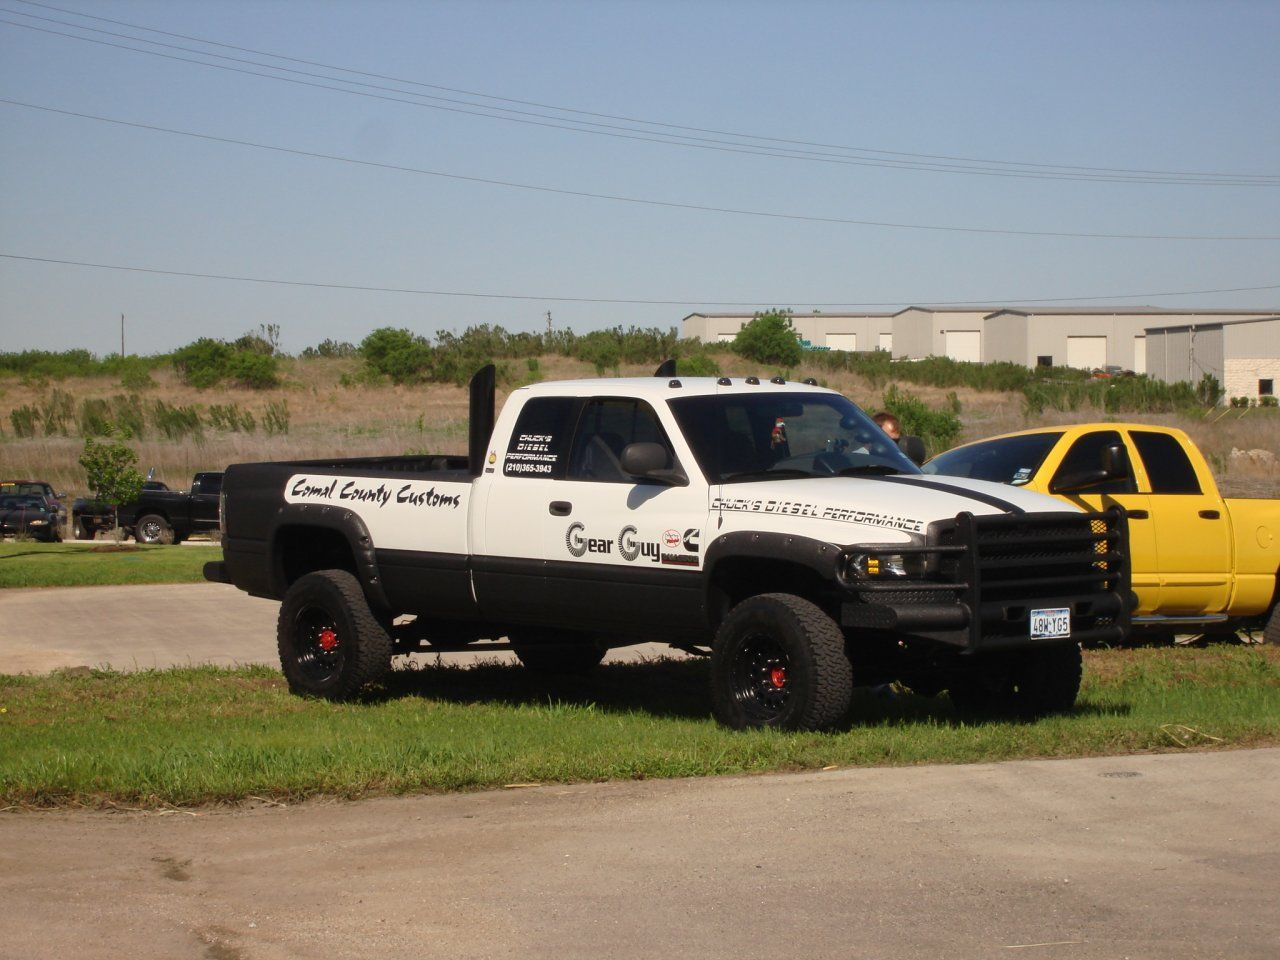 Http Www Gautoparts Com Blog Path Wp Content Gallery 1087 2000 Dodge Ram 2500 Pickup 11 Jpg Diesel Trucks Dodge Trucks Ram Dodge Ram